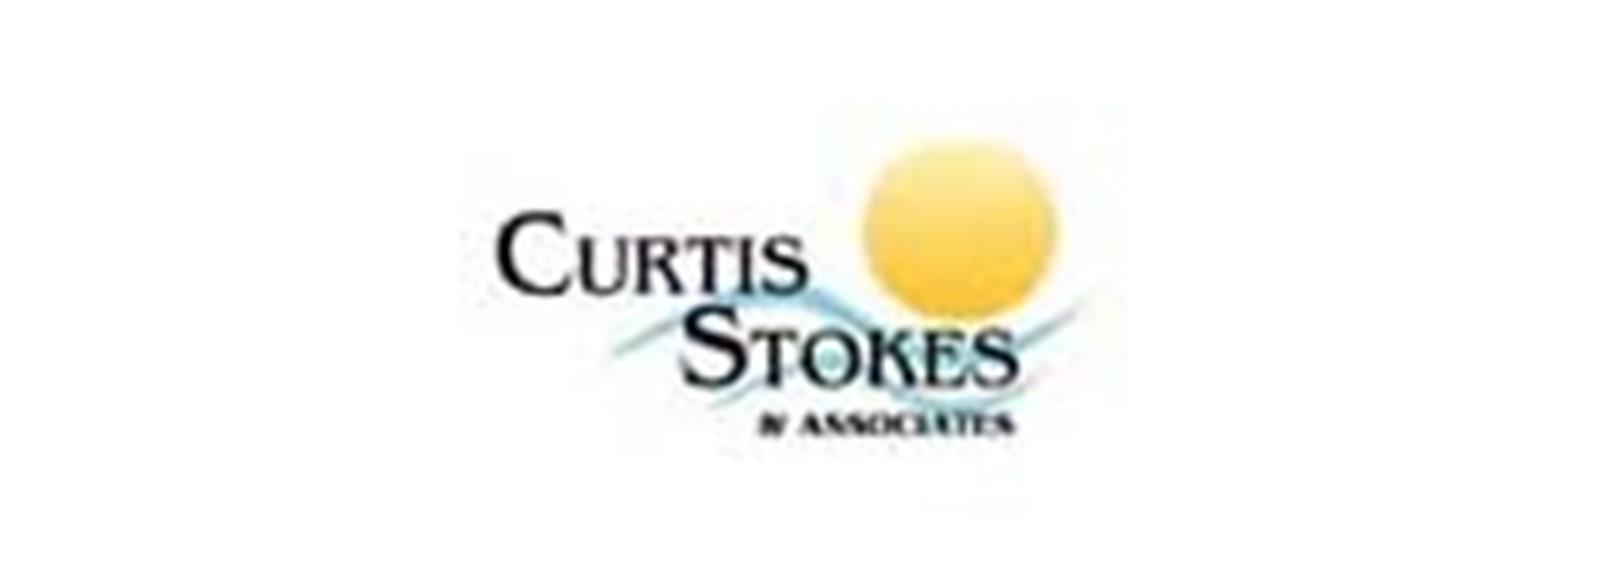 Curtis Stokes & Associates, Inc.